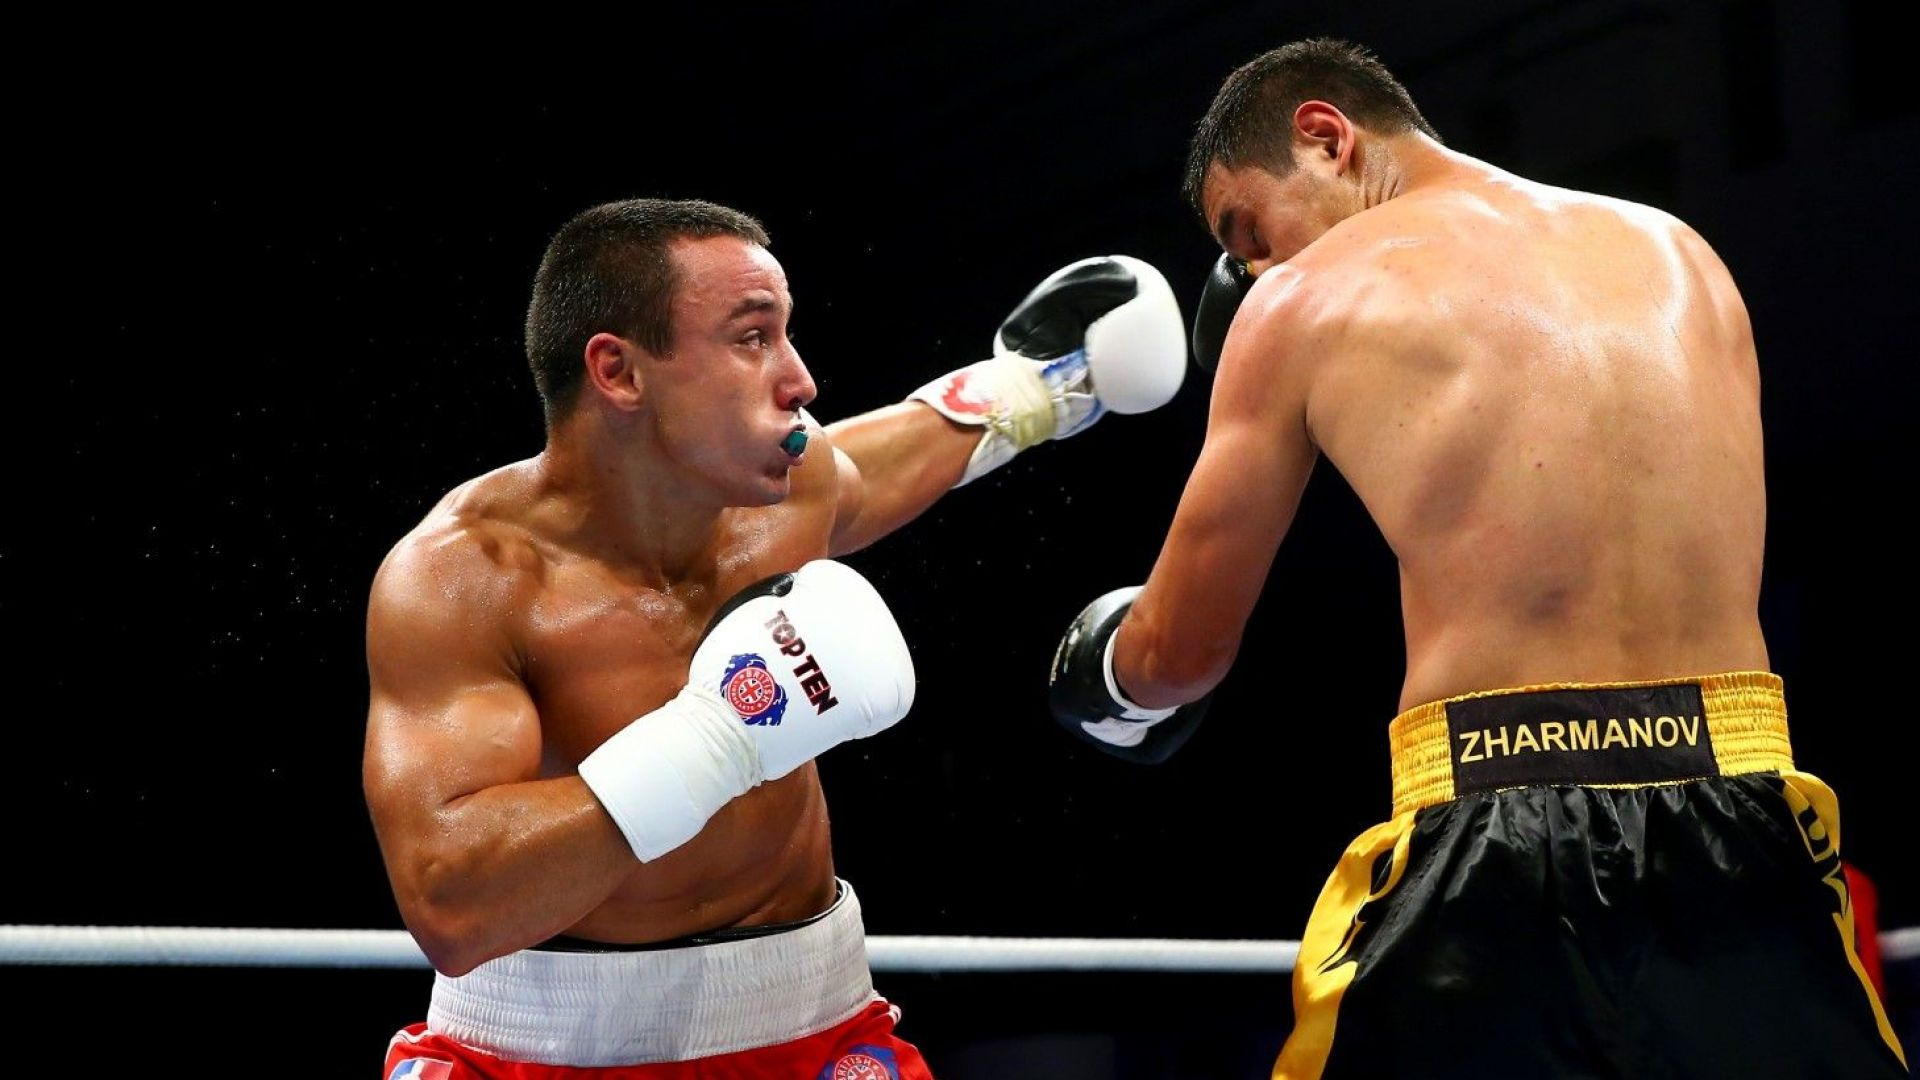 Руснак уби мечтата на Панталеев за световен финал